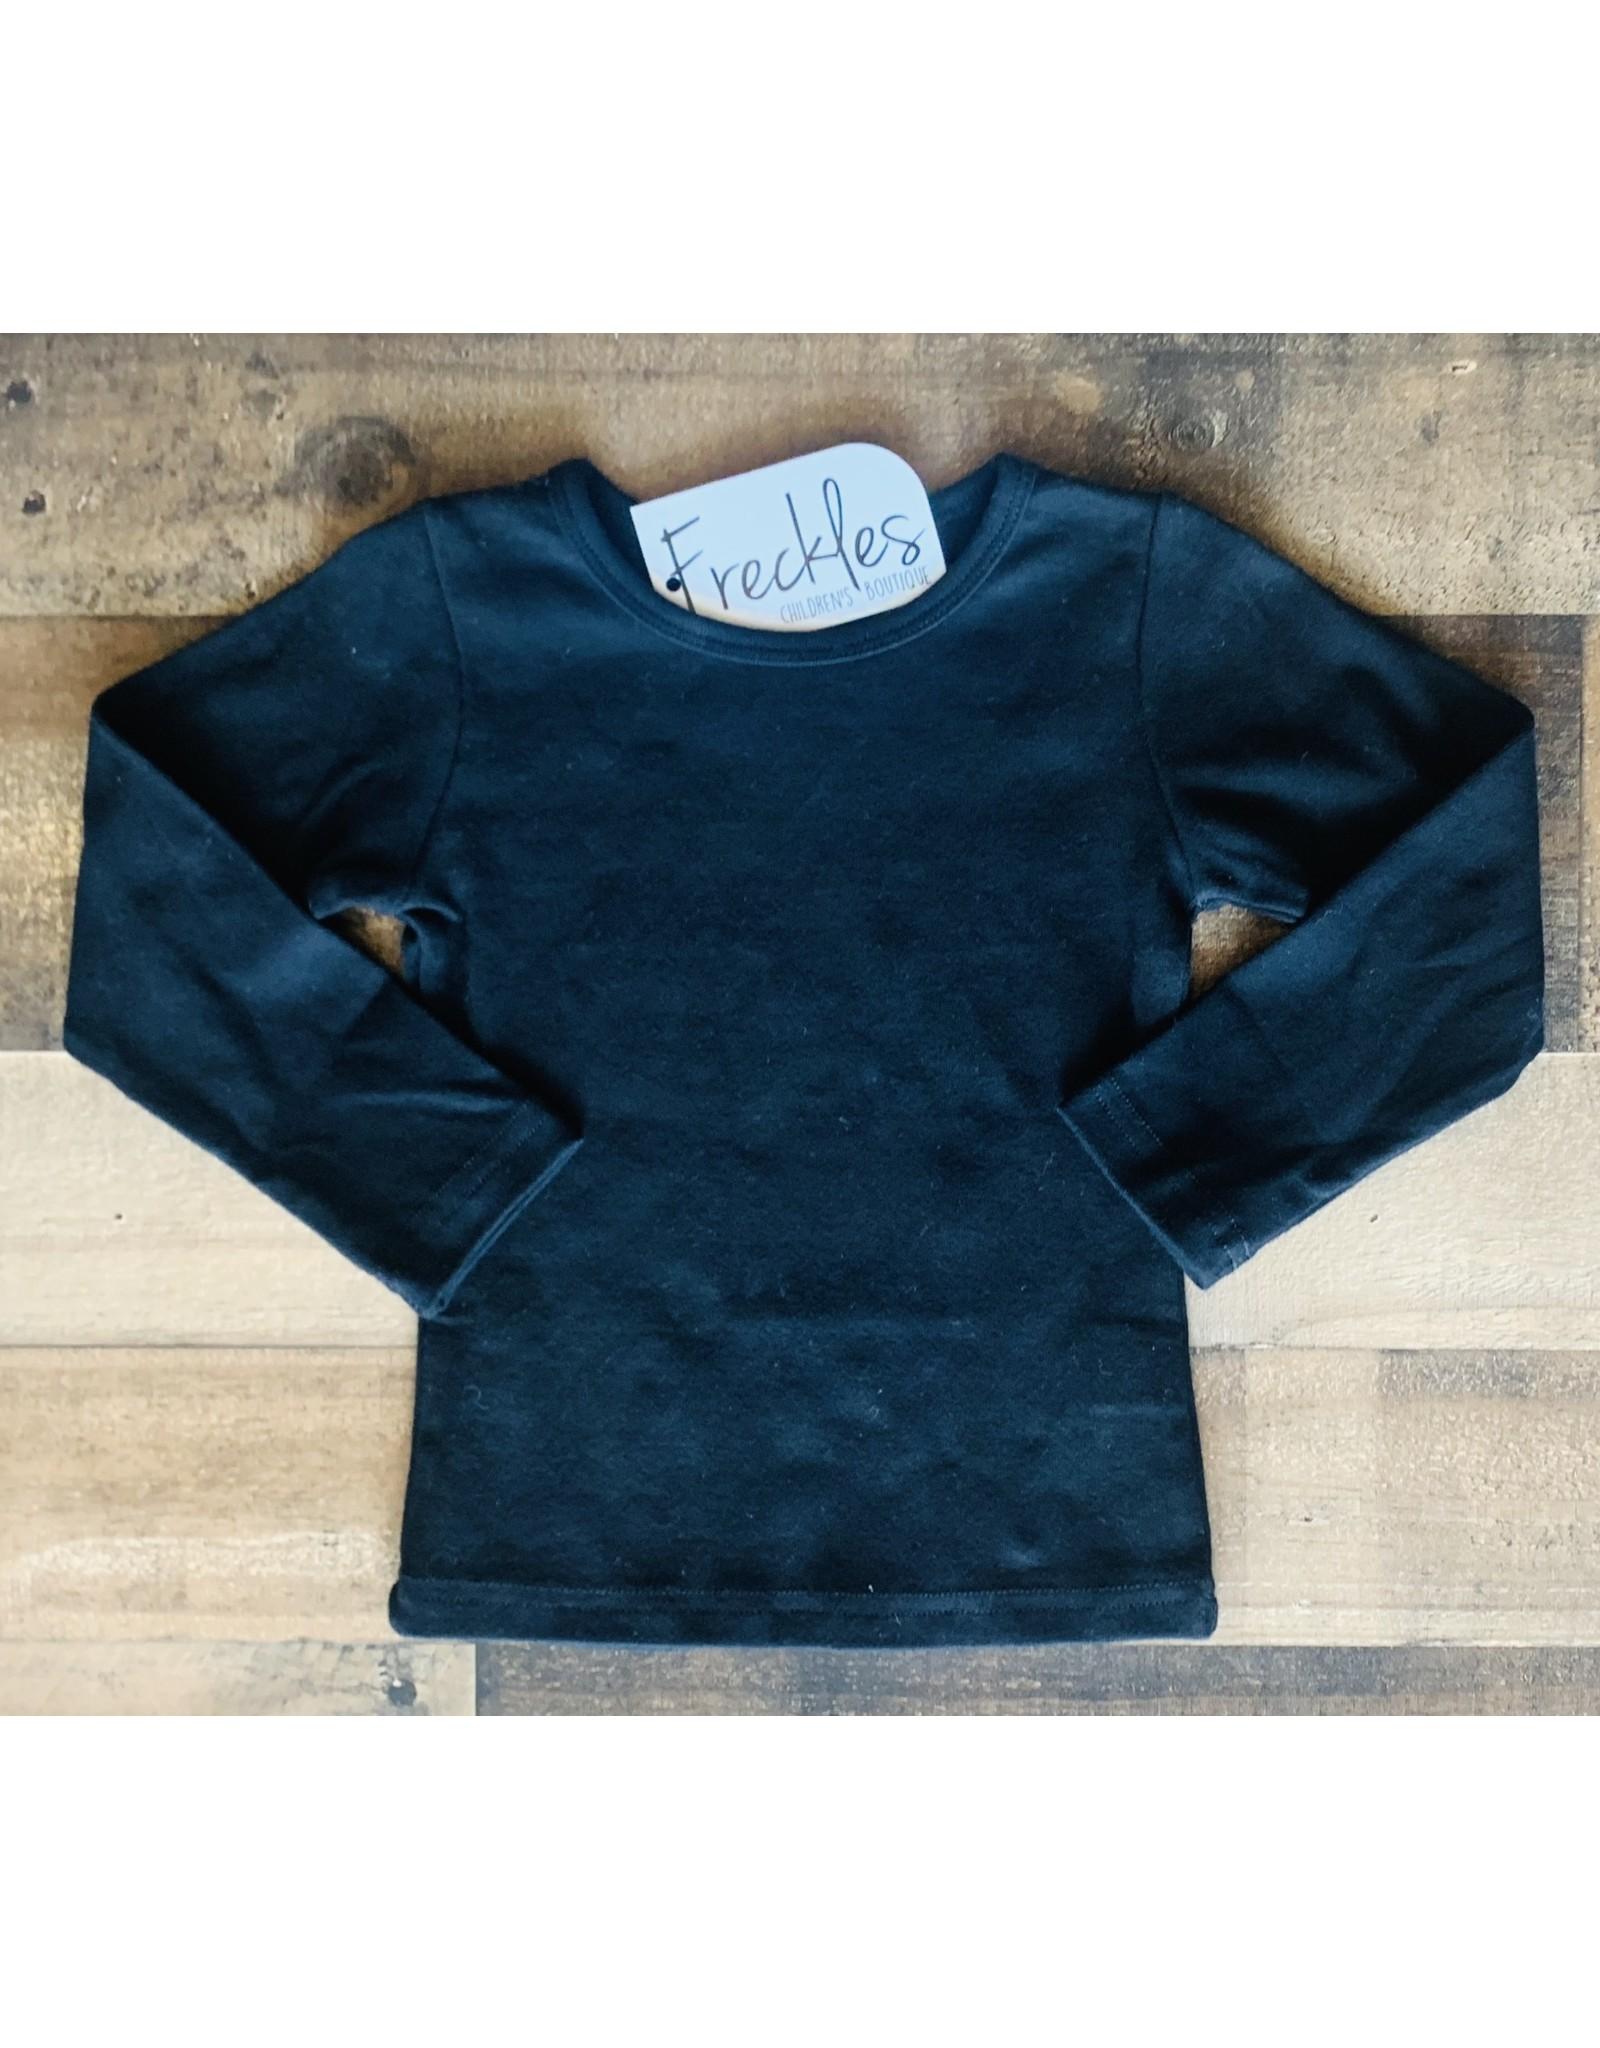 Black L/S Shirt